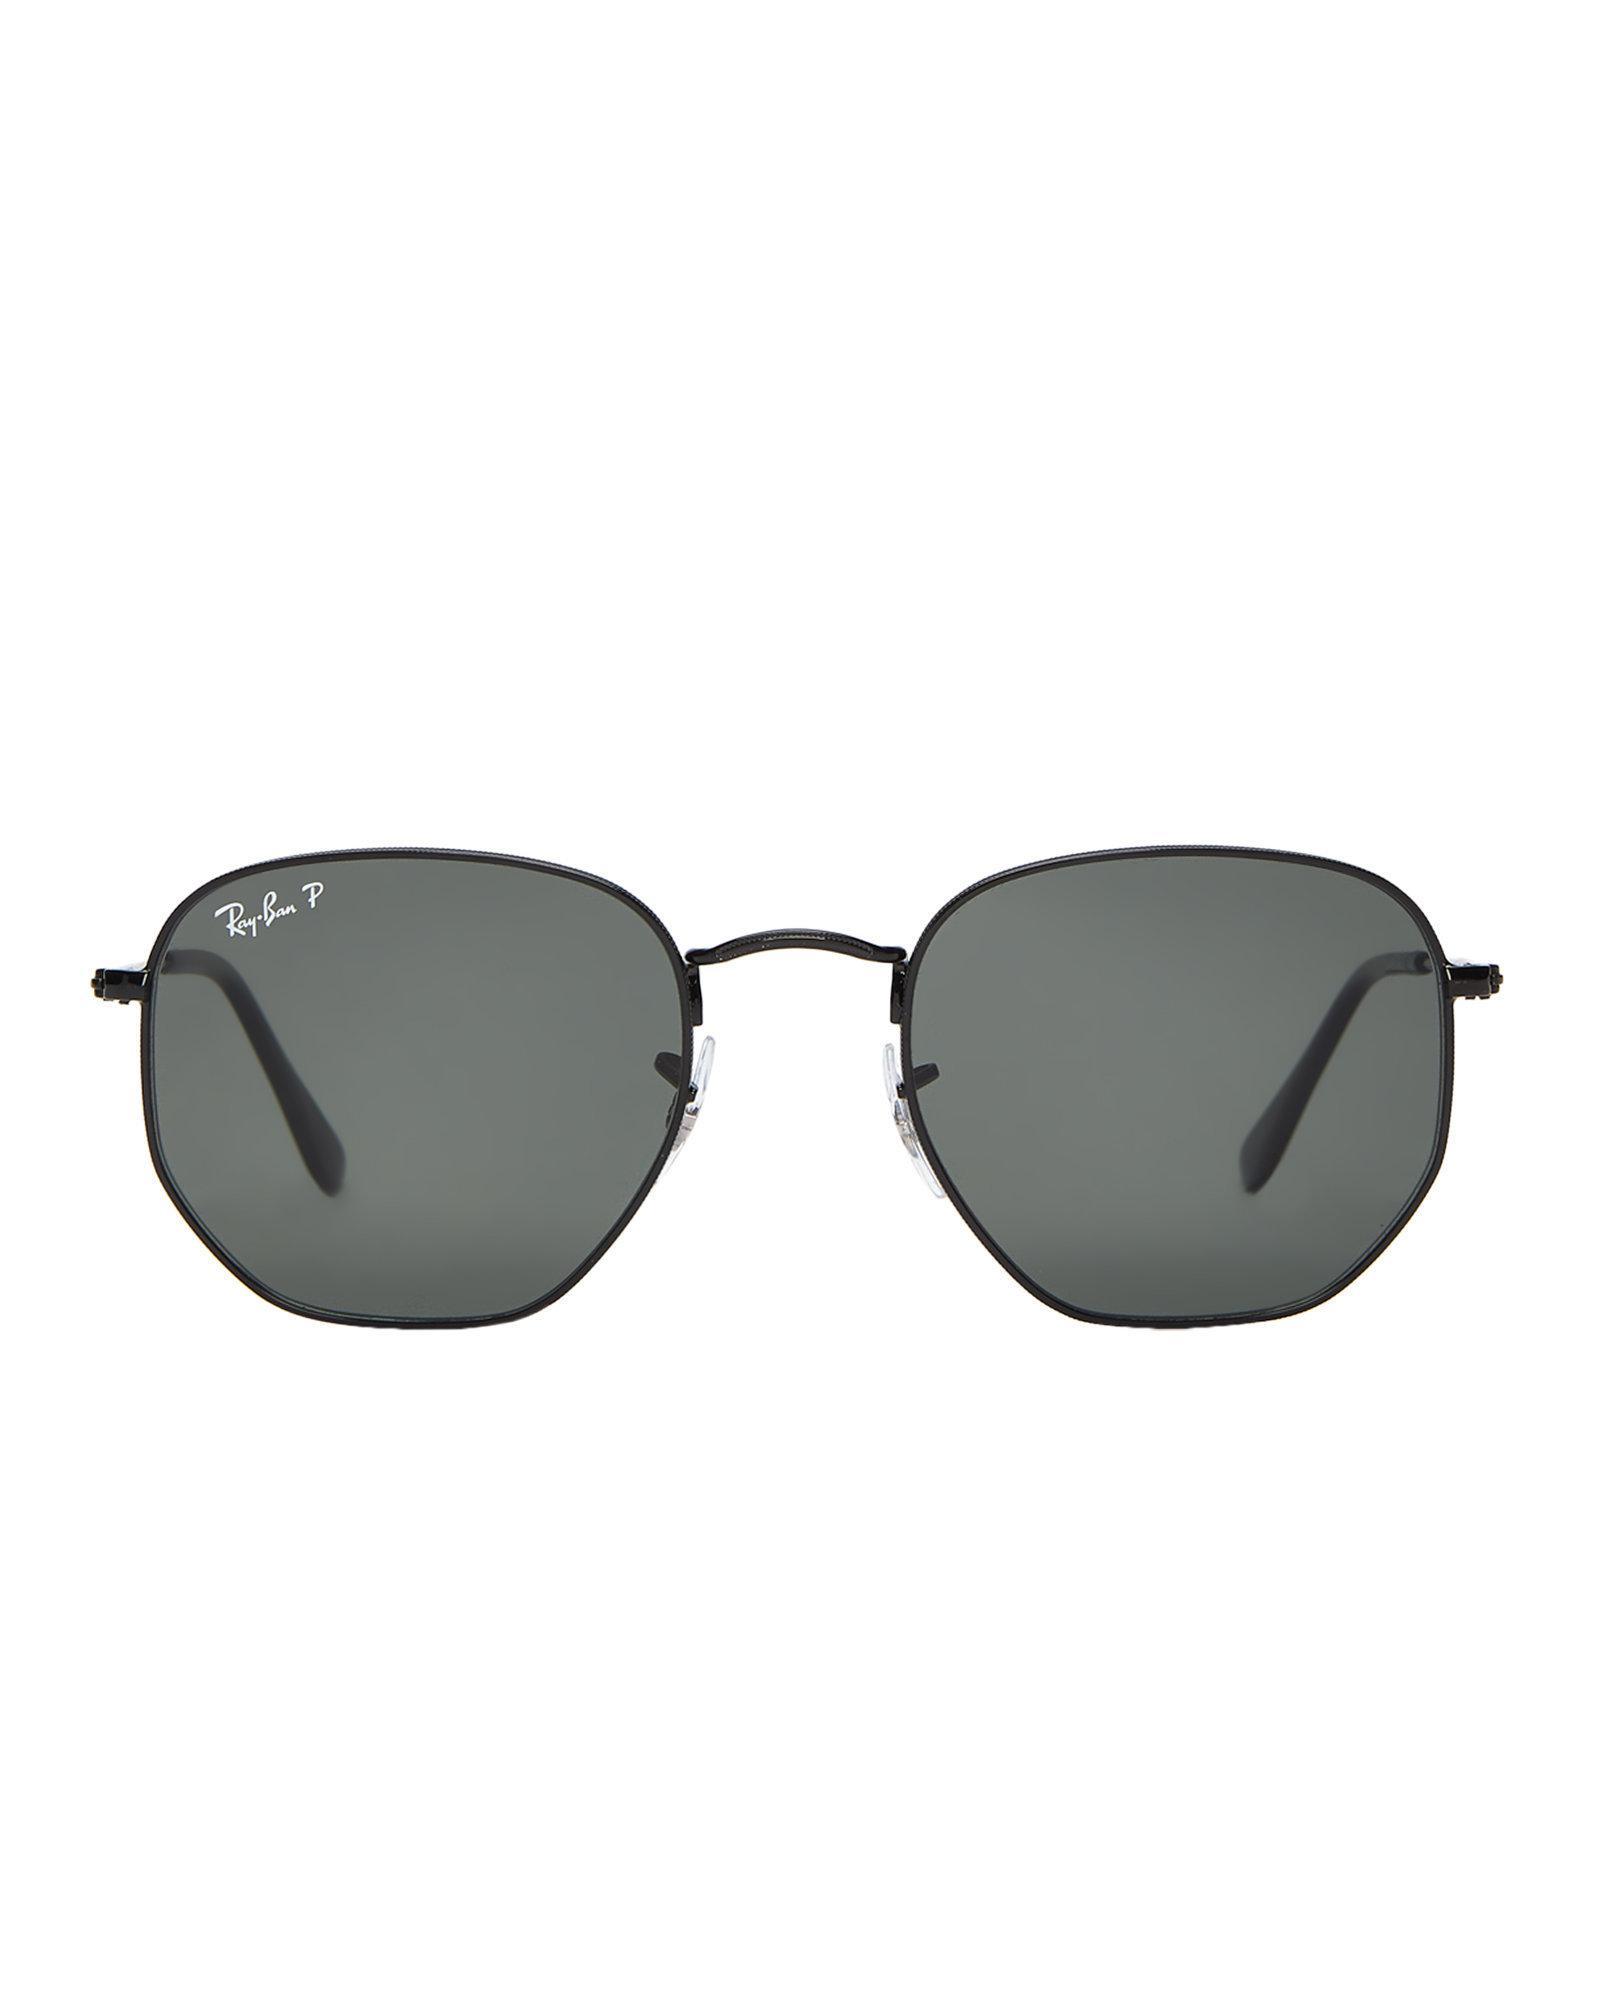 df20fc1fb728a Ray-Ban Rb 3548-n Black Polarized Hexagonal Sunglasses in Black - Lyst